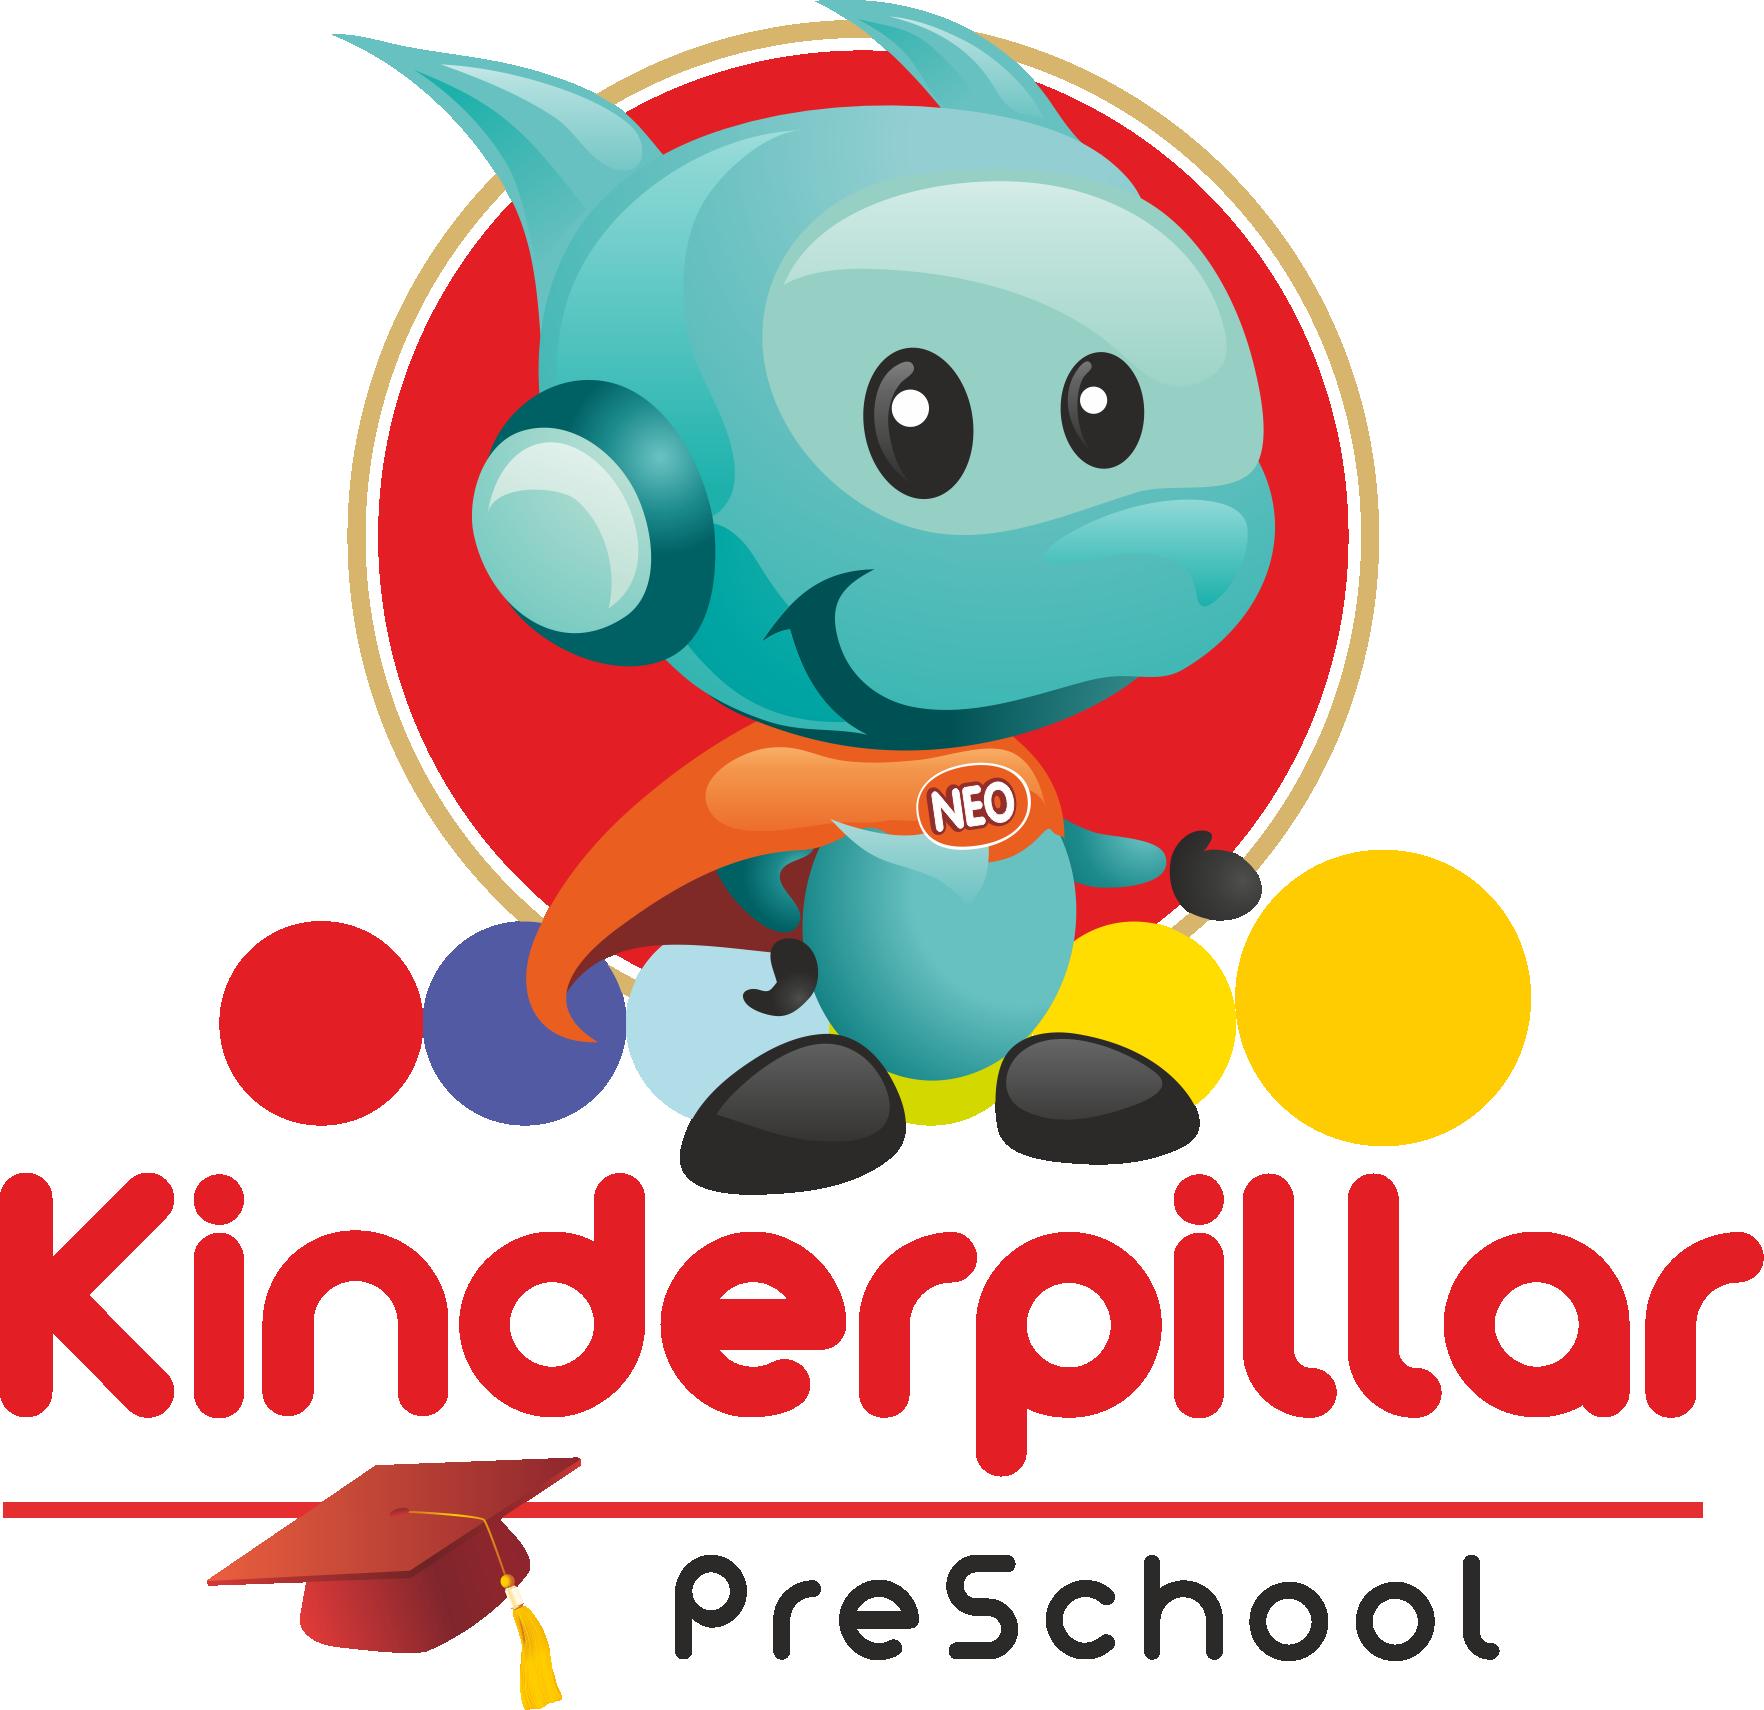 Nursery Rhymes - Kinderpillar